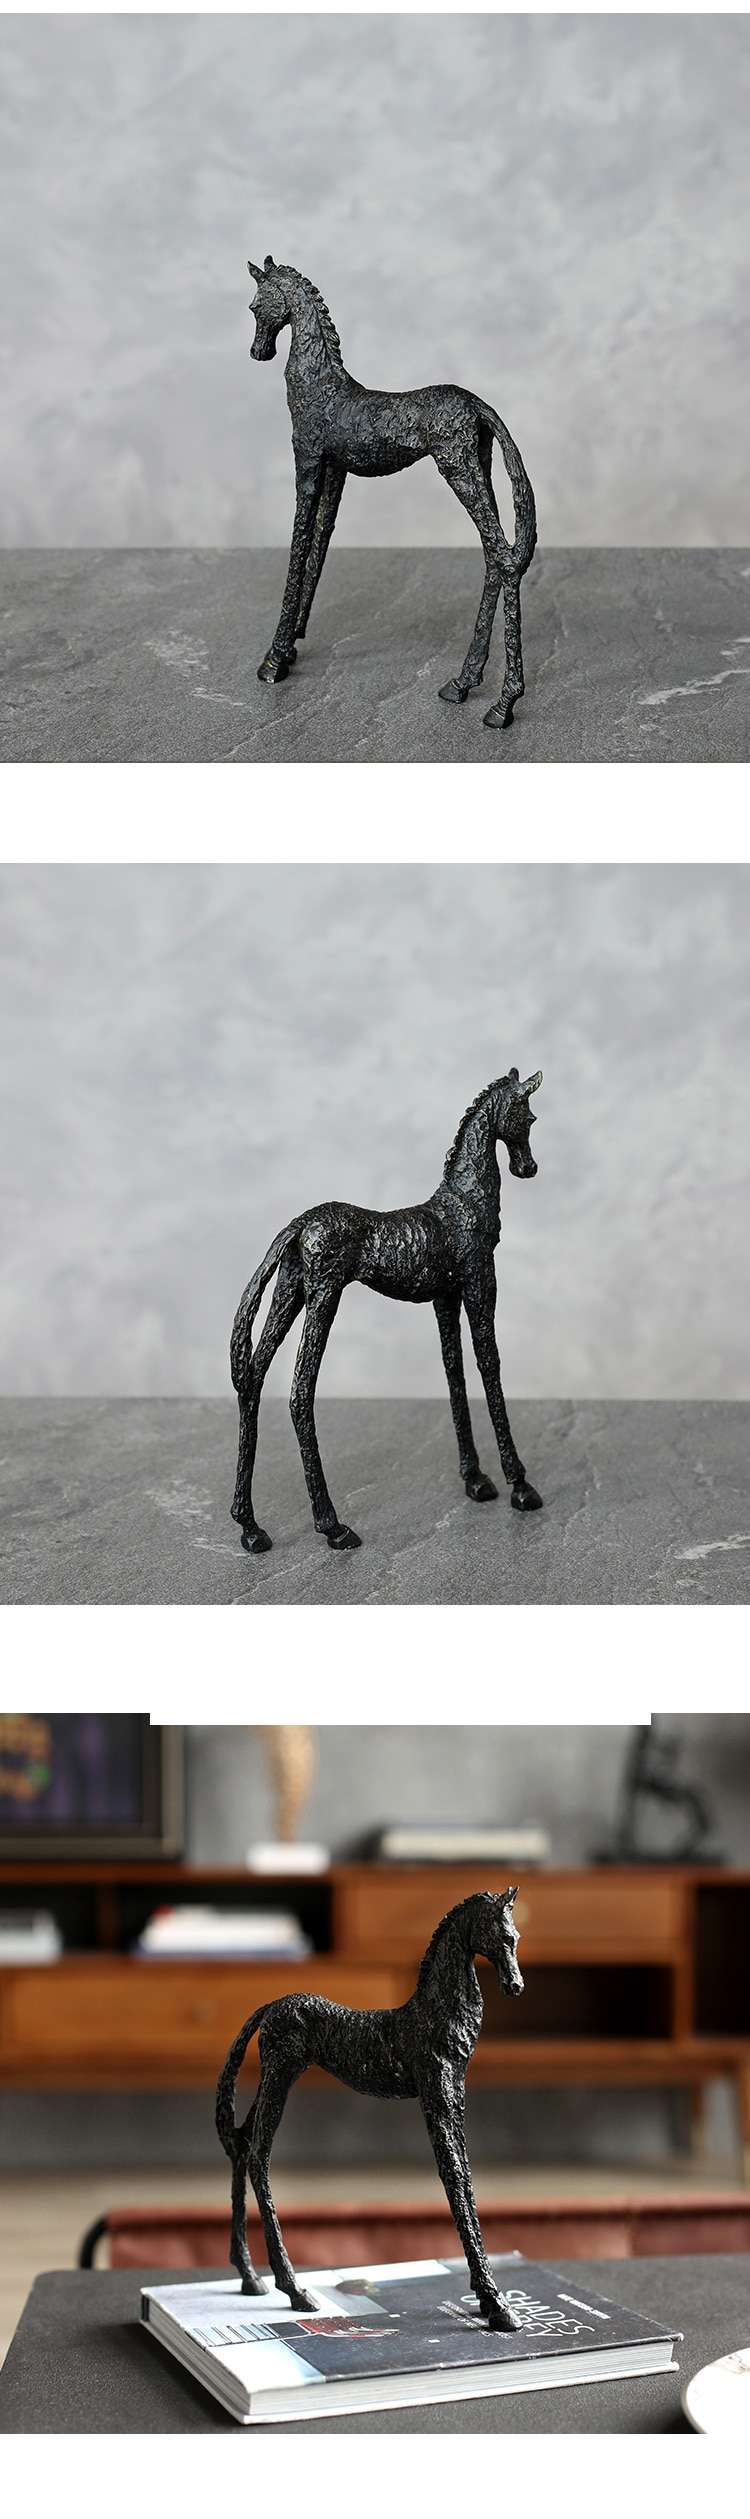 Standing Horse Figurines Decorative Animals Desktop Gift Metal Statue Ornaments Home Decoration Casa Living Room Accessories